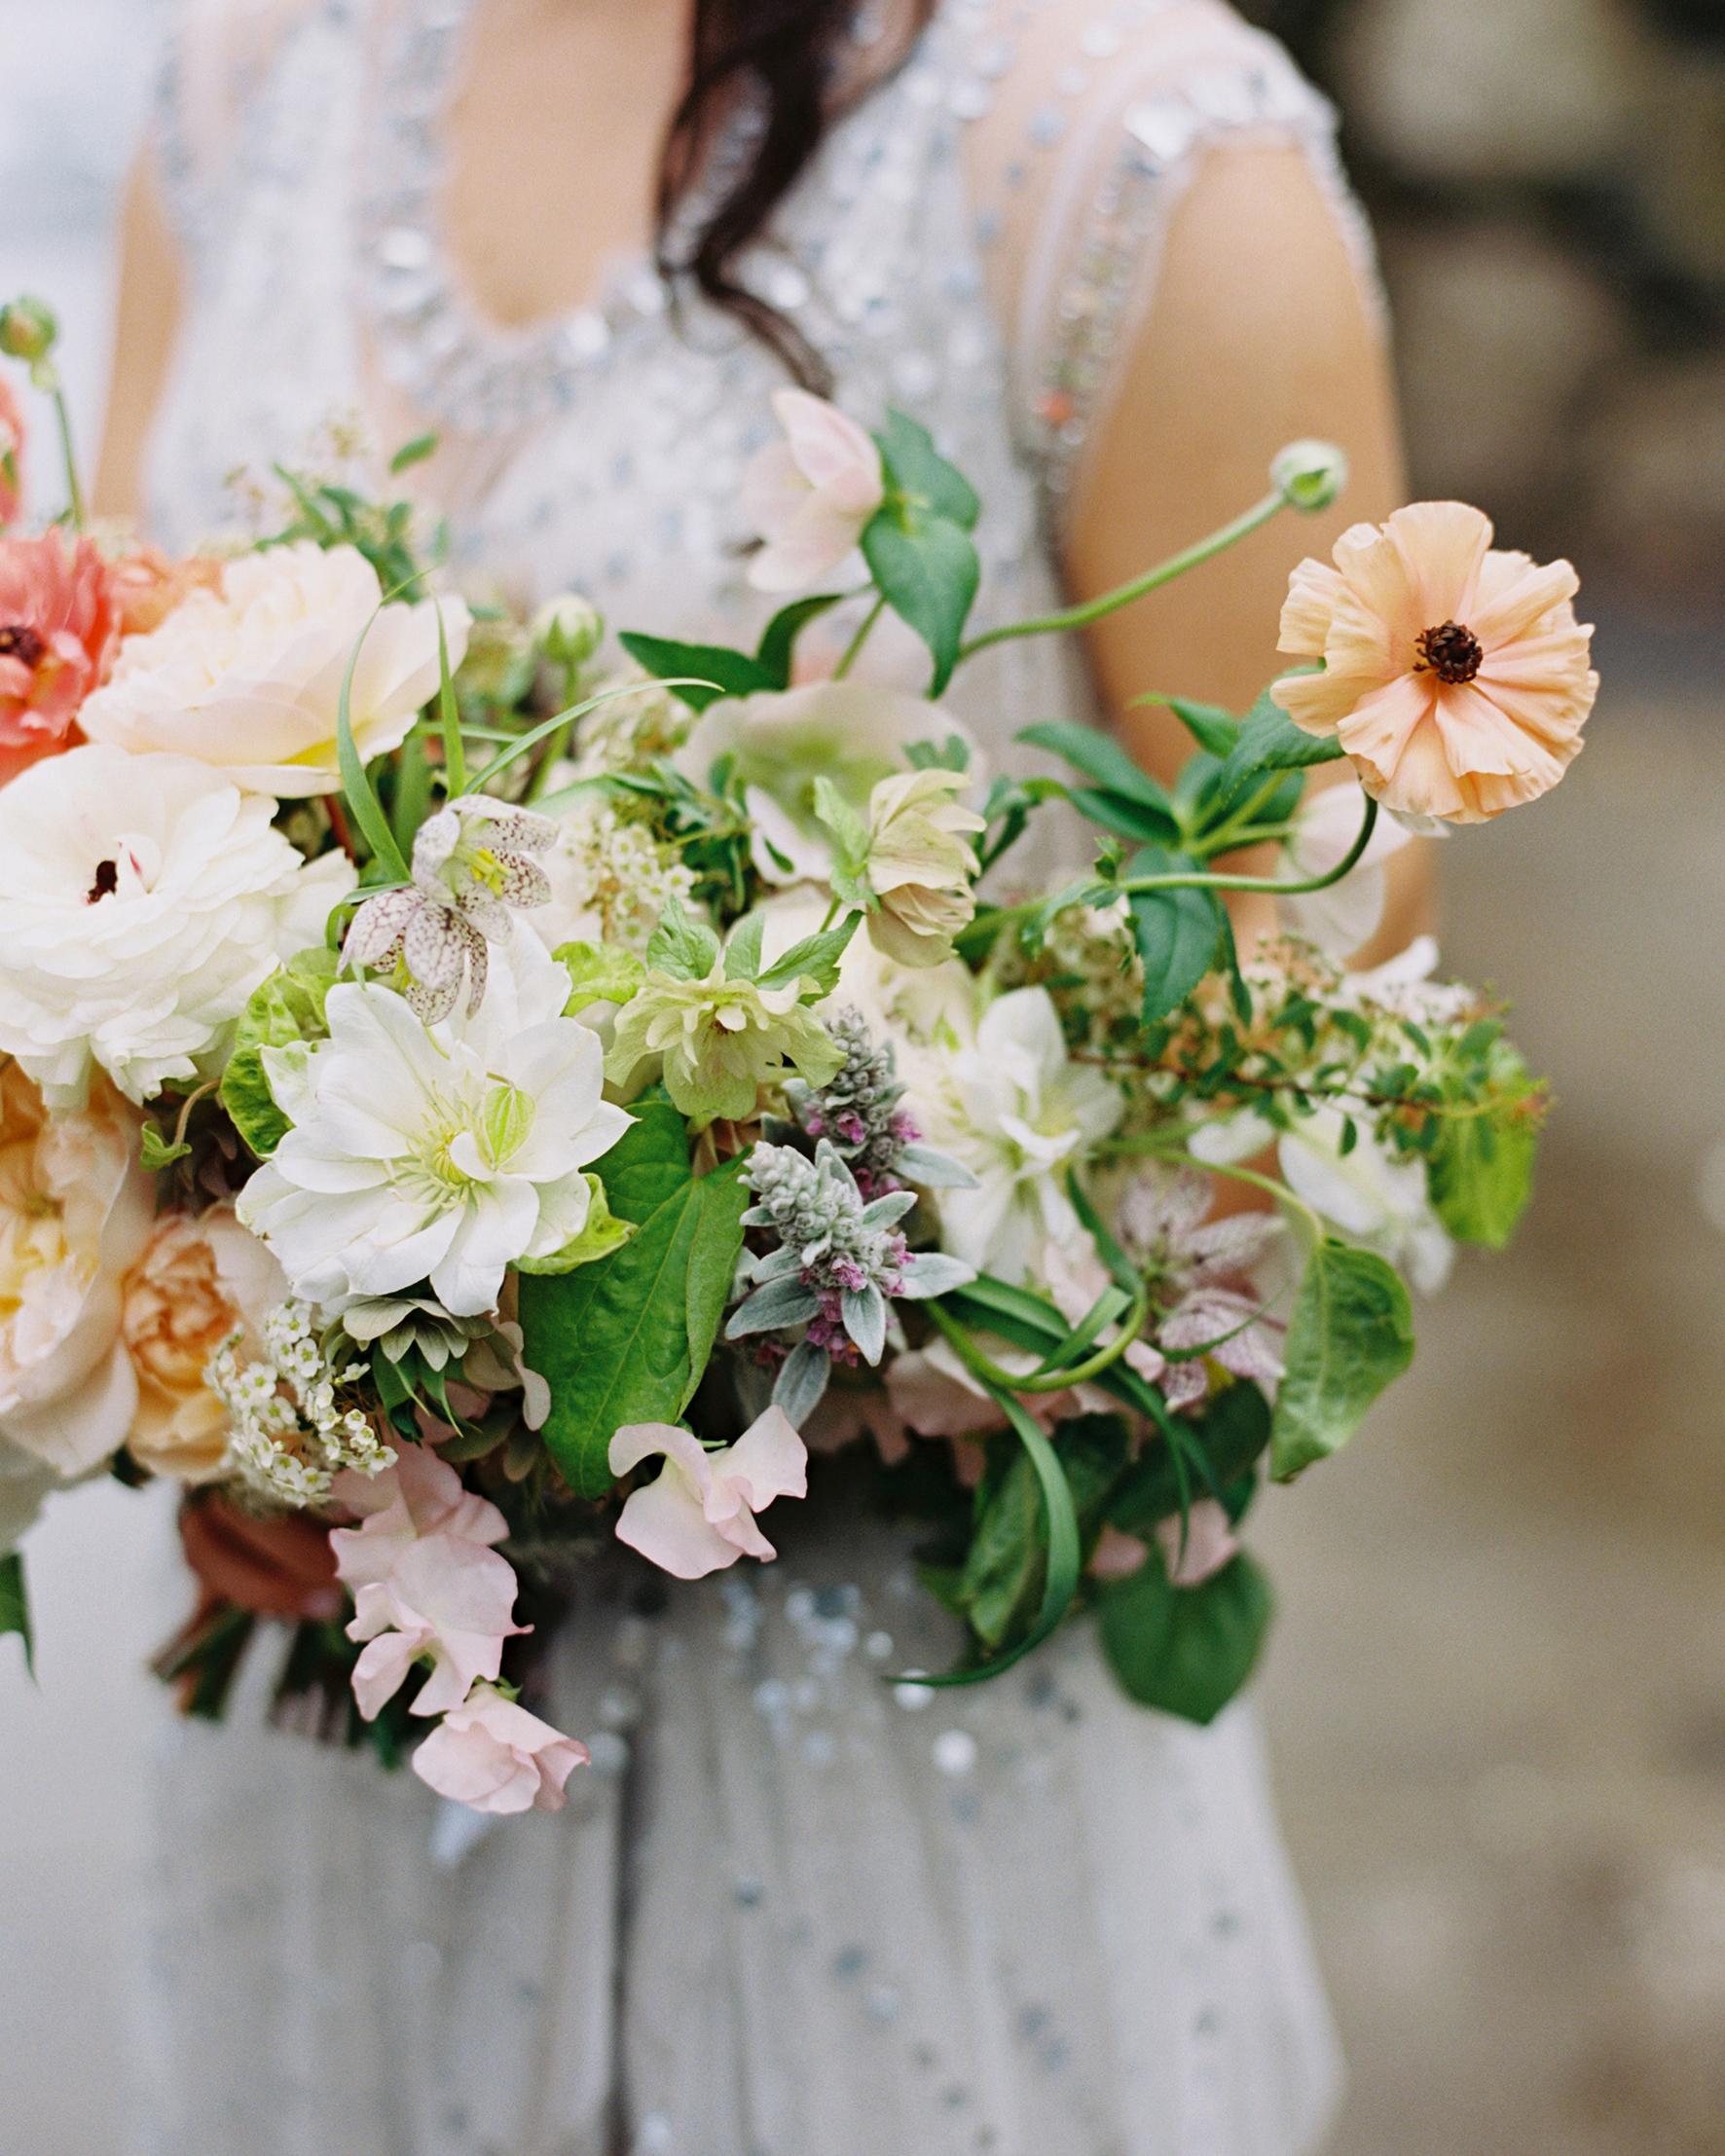 sydney-christina-wedding-bouquet-019-s111743-0115.jpg